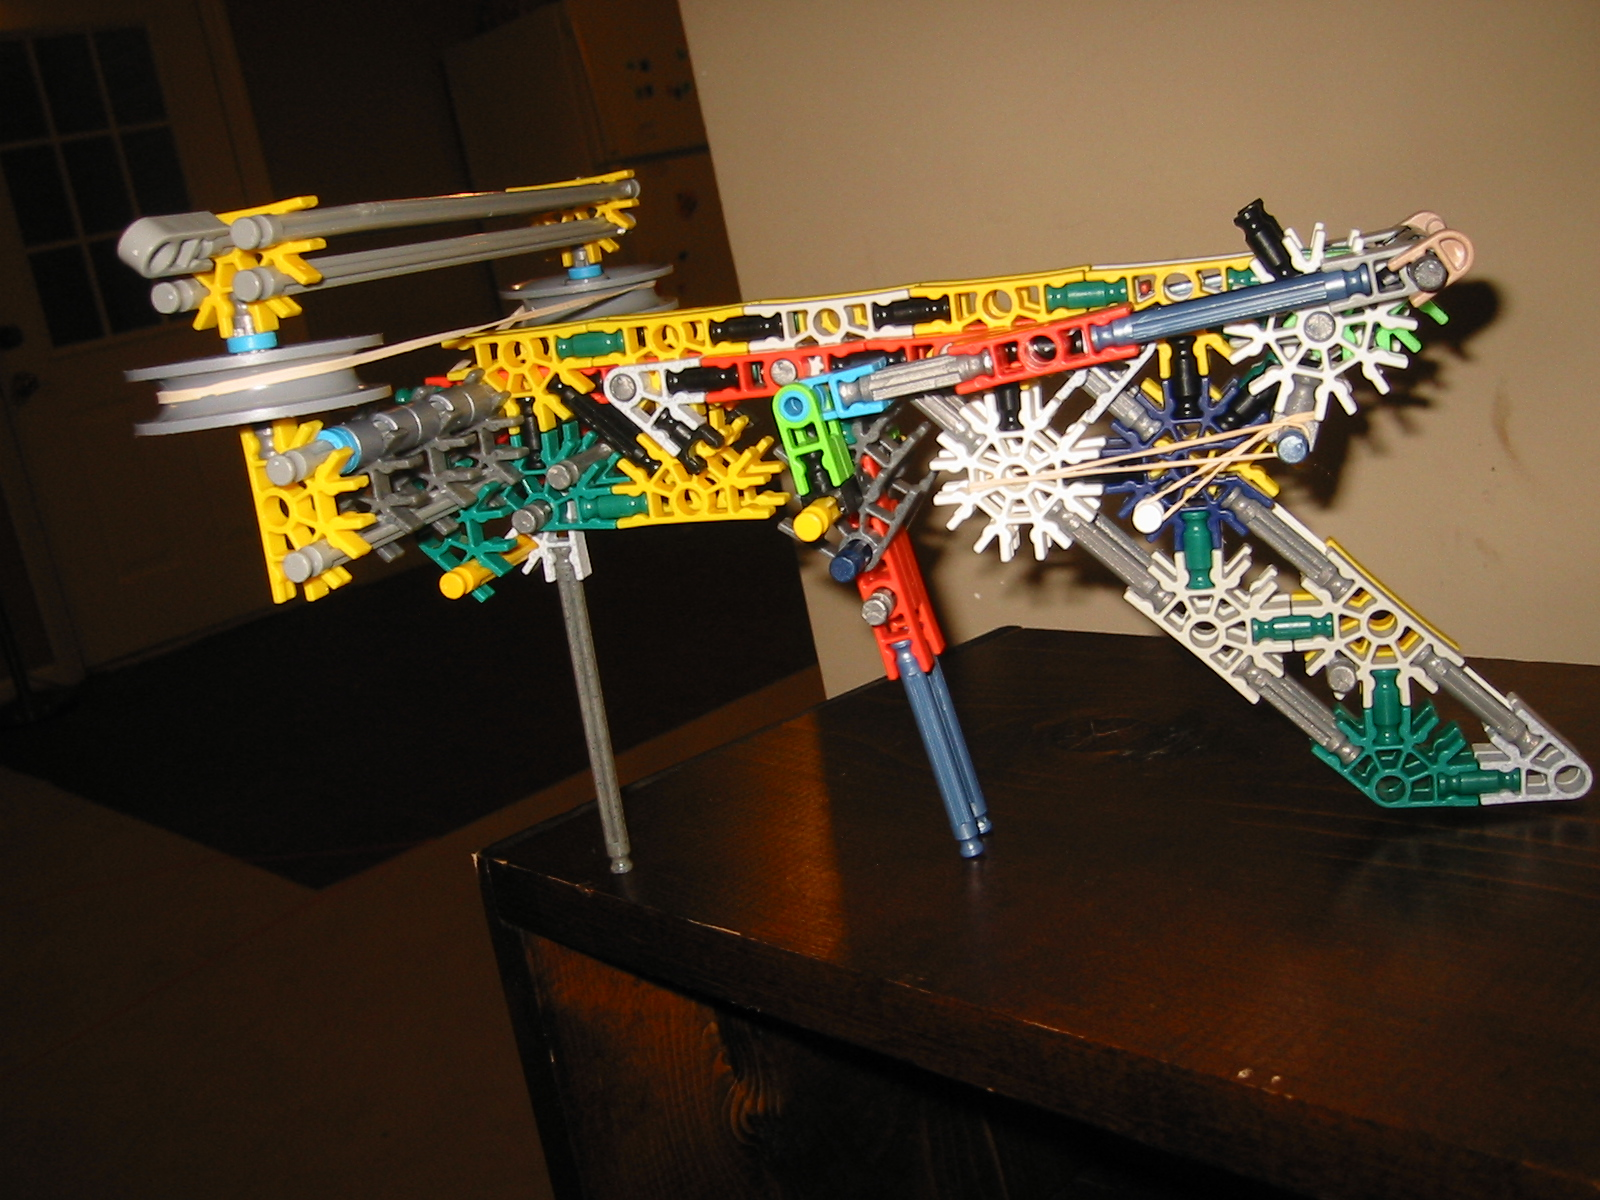 Knex_builder_Freak's crossbow mods